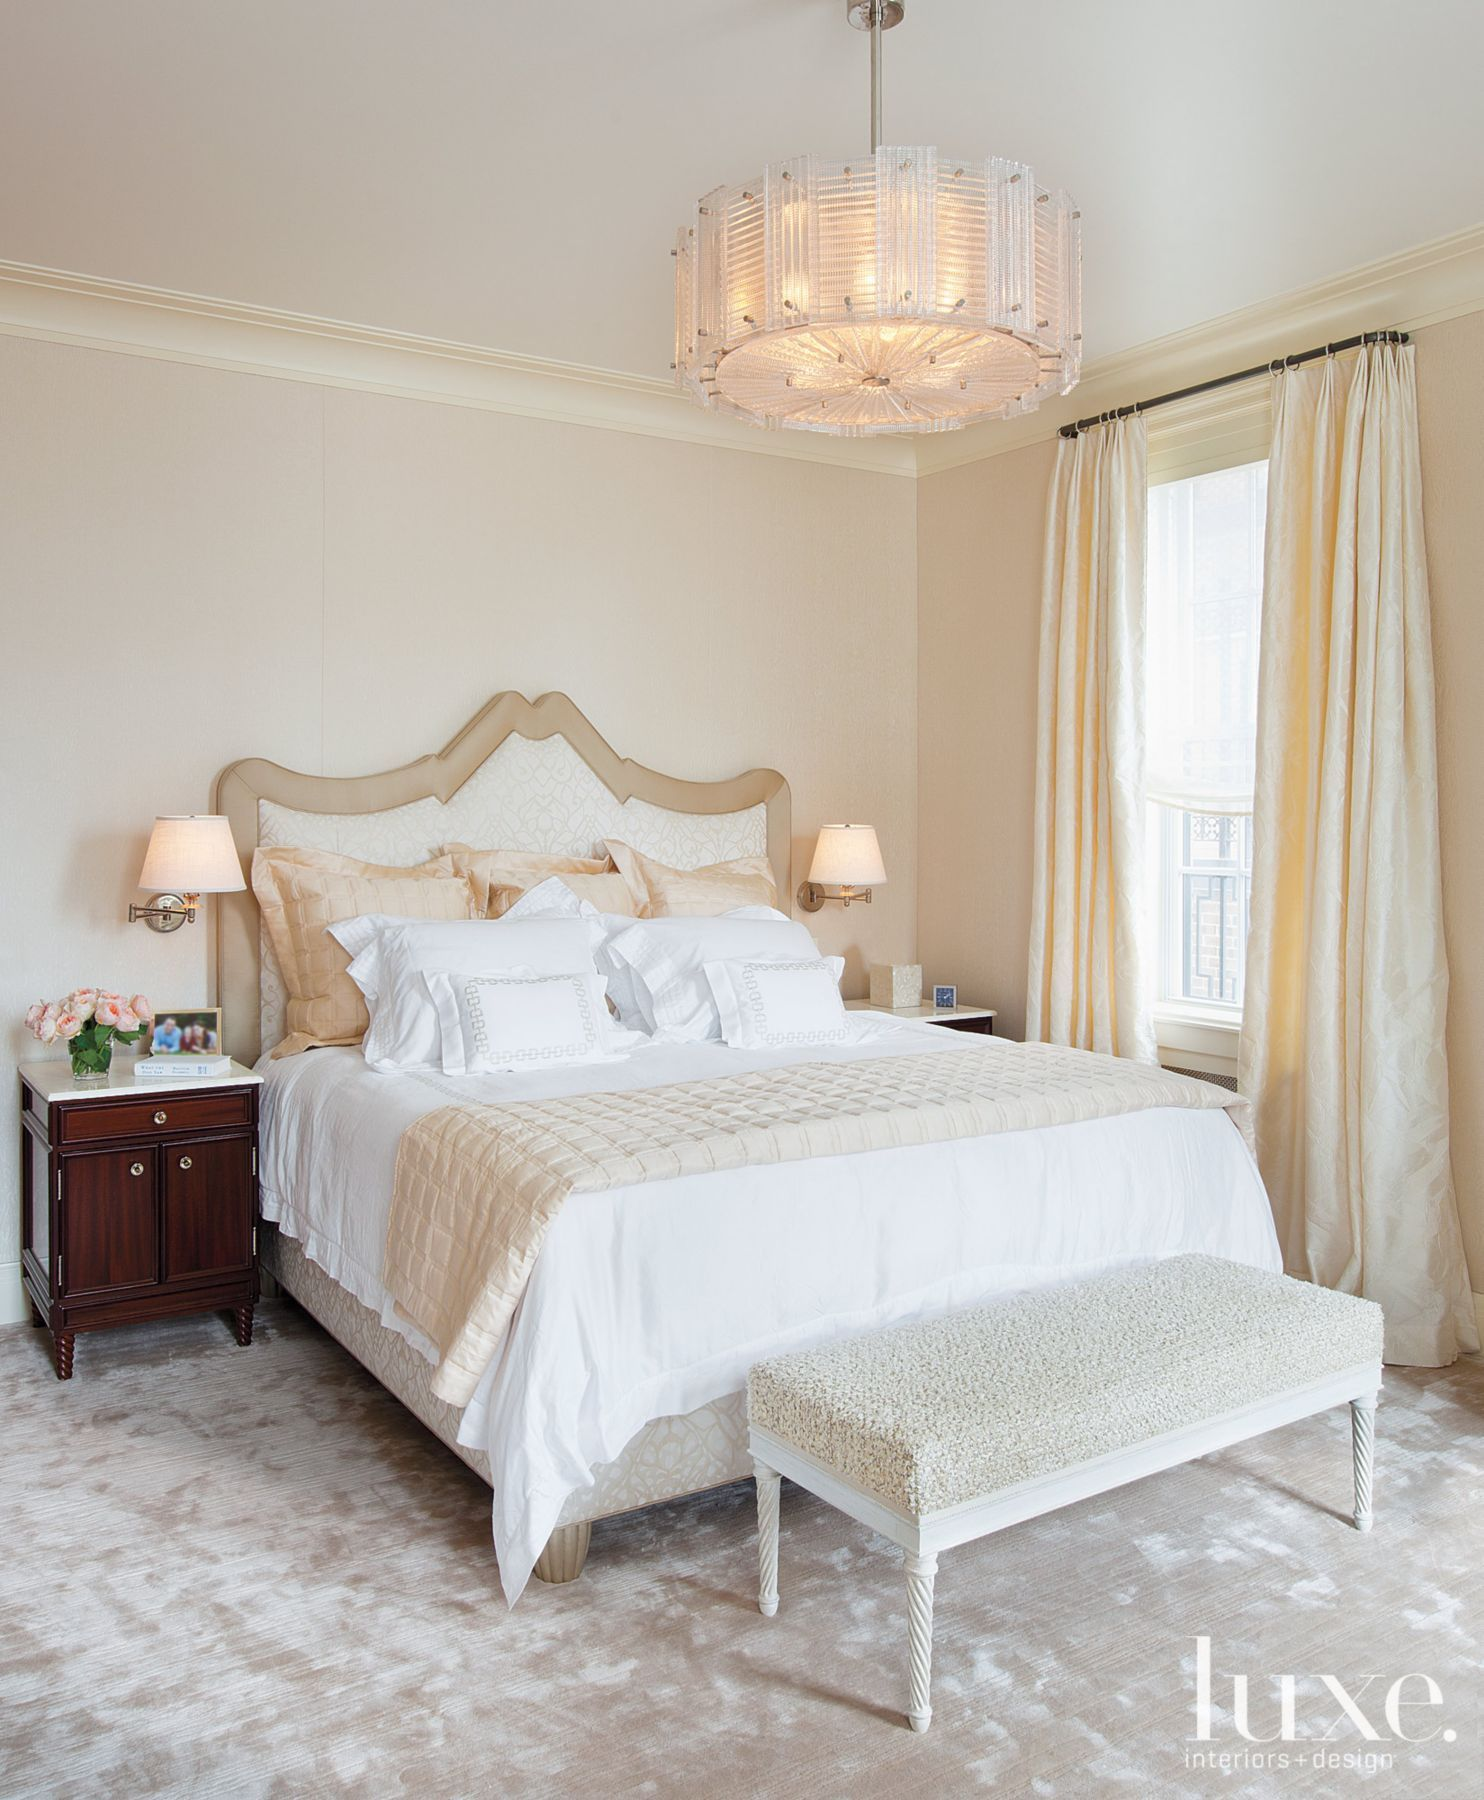 25 Stunning Transitional Bedroom Design Ideas: Transitional Cream Bathroom With Mosaic Travertine Tile